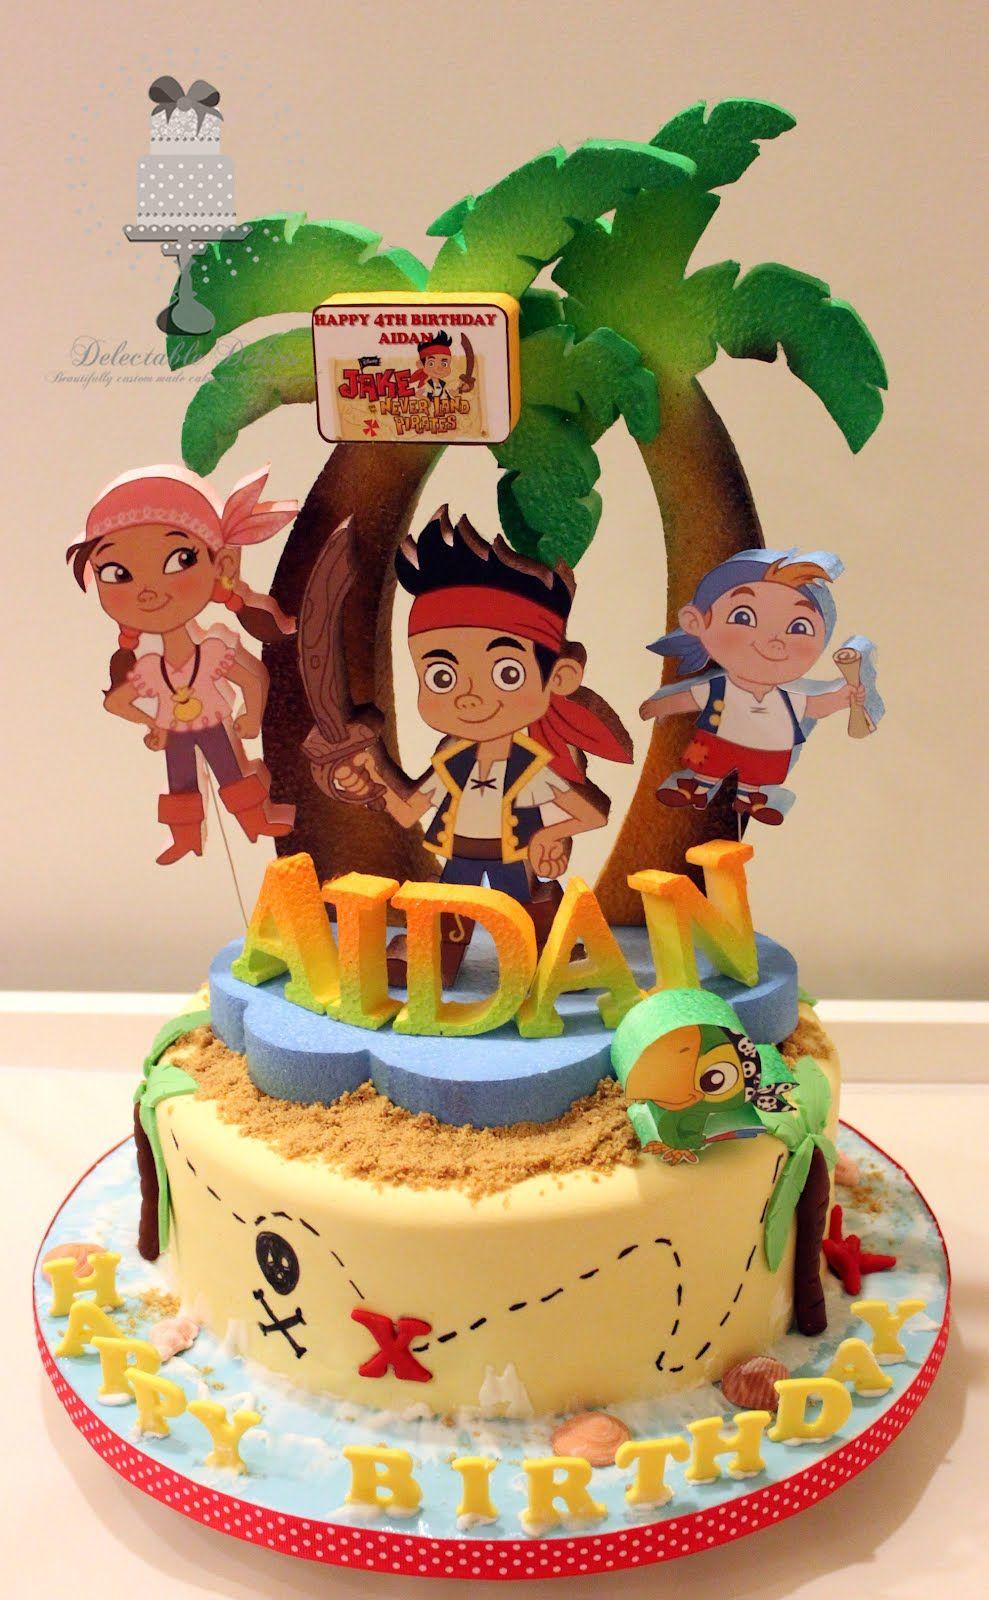 Jake And The Neverland Pirates Birthday Cake Con Imagenes